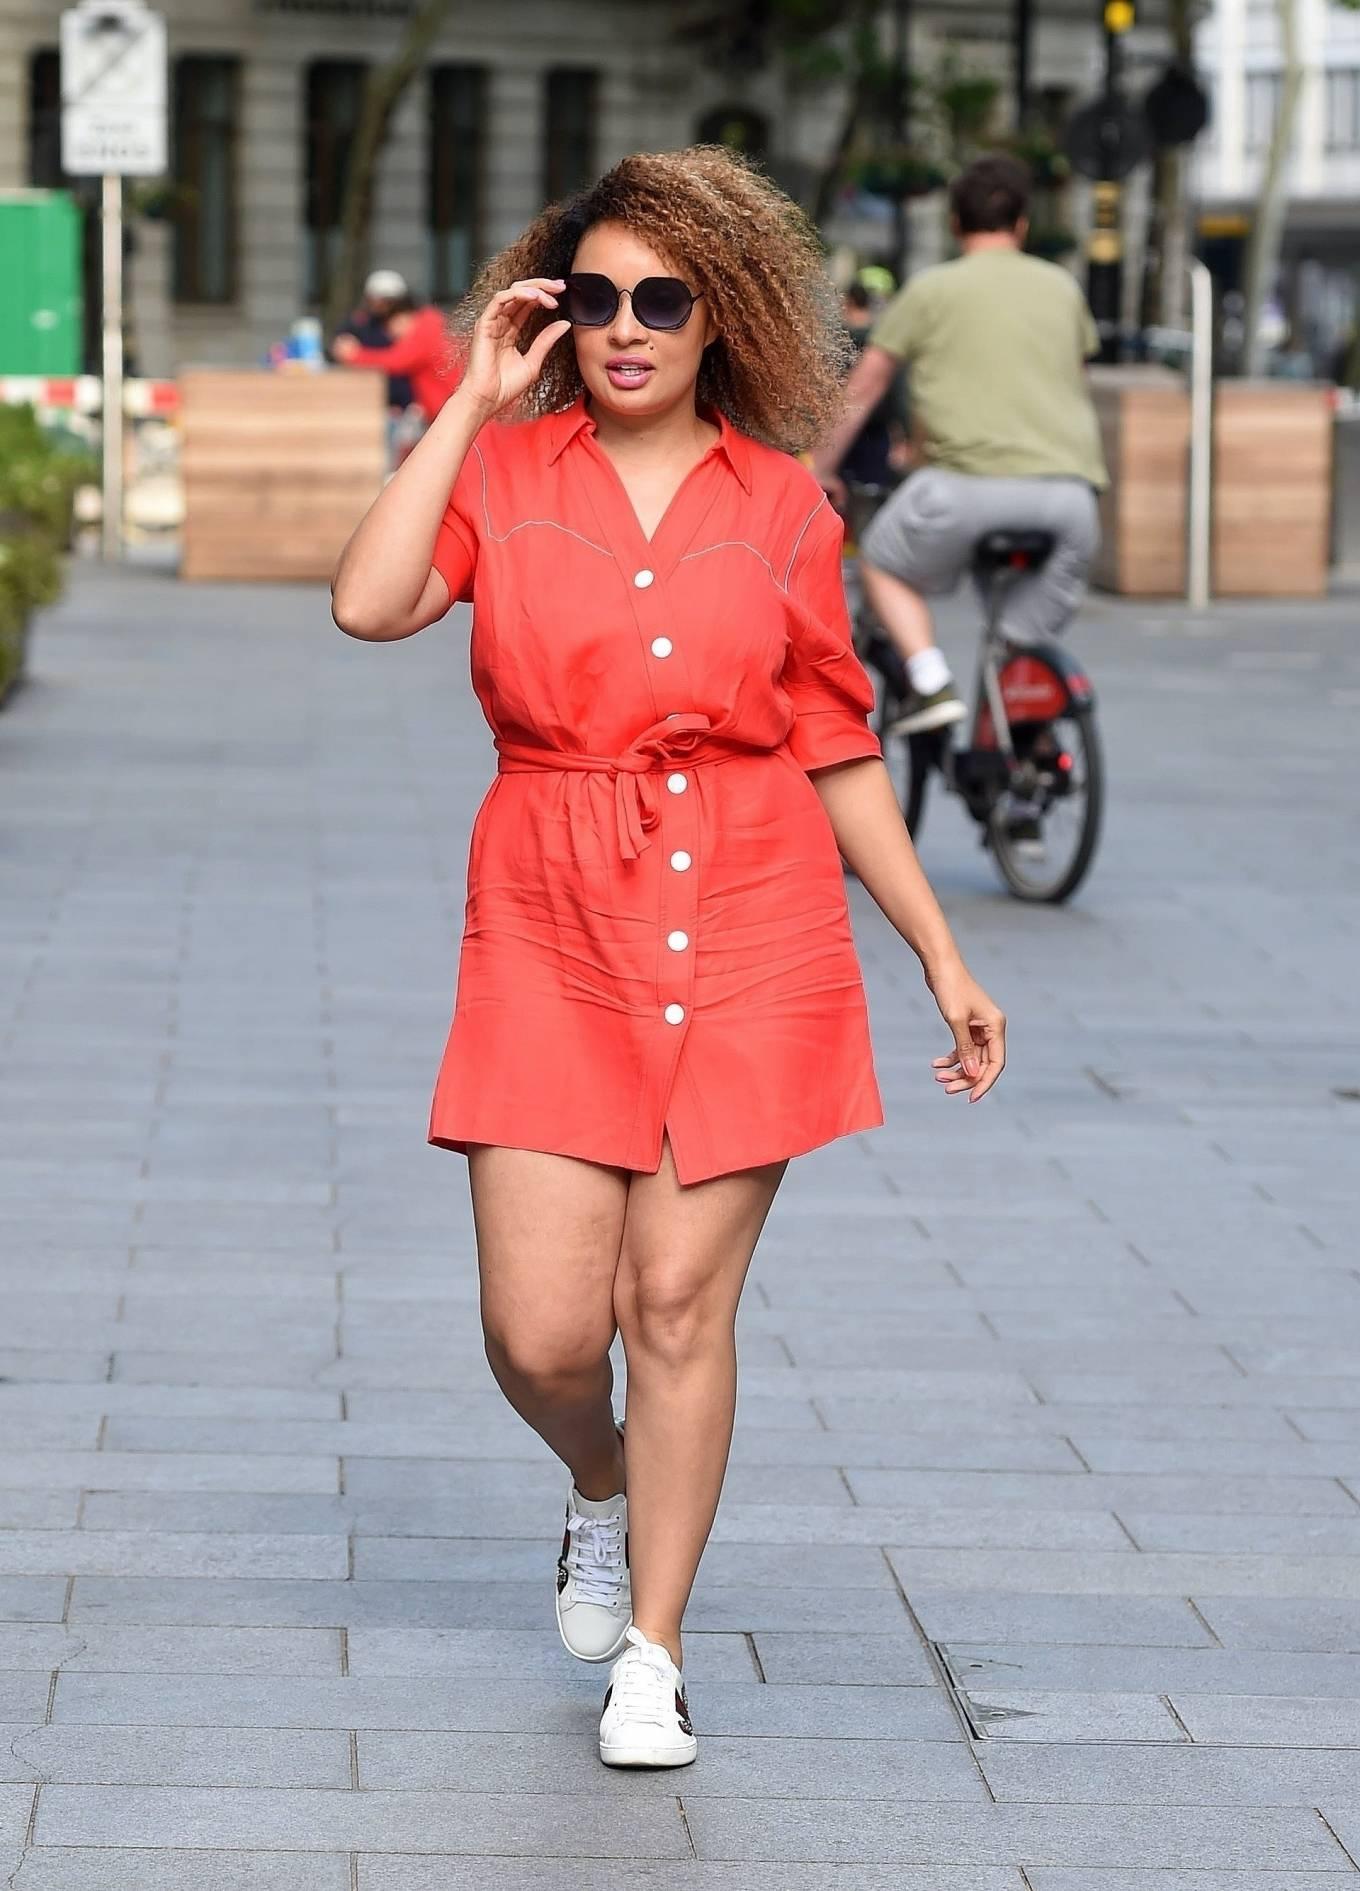 Pandora Christie in Mini Dress - Arriving at Global Radio Studios in London